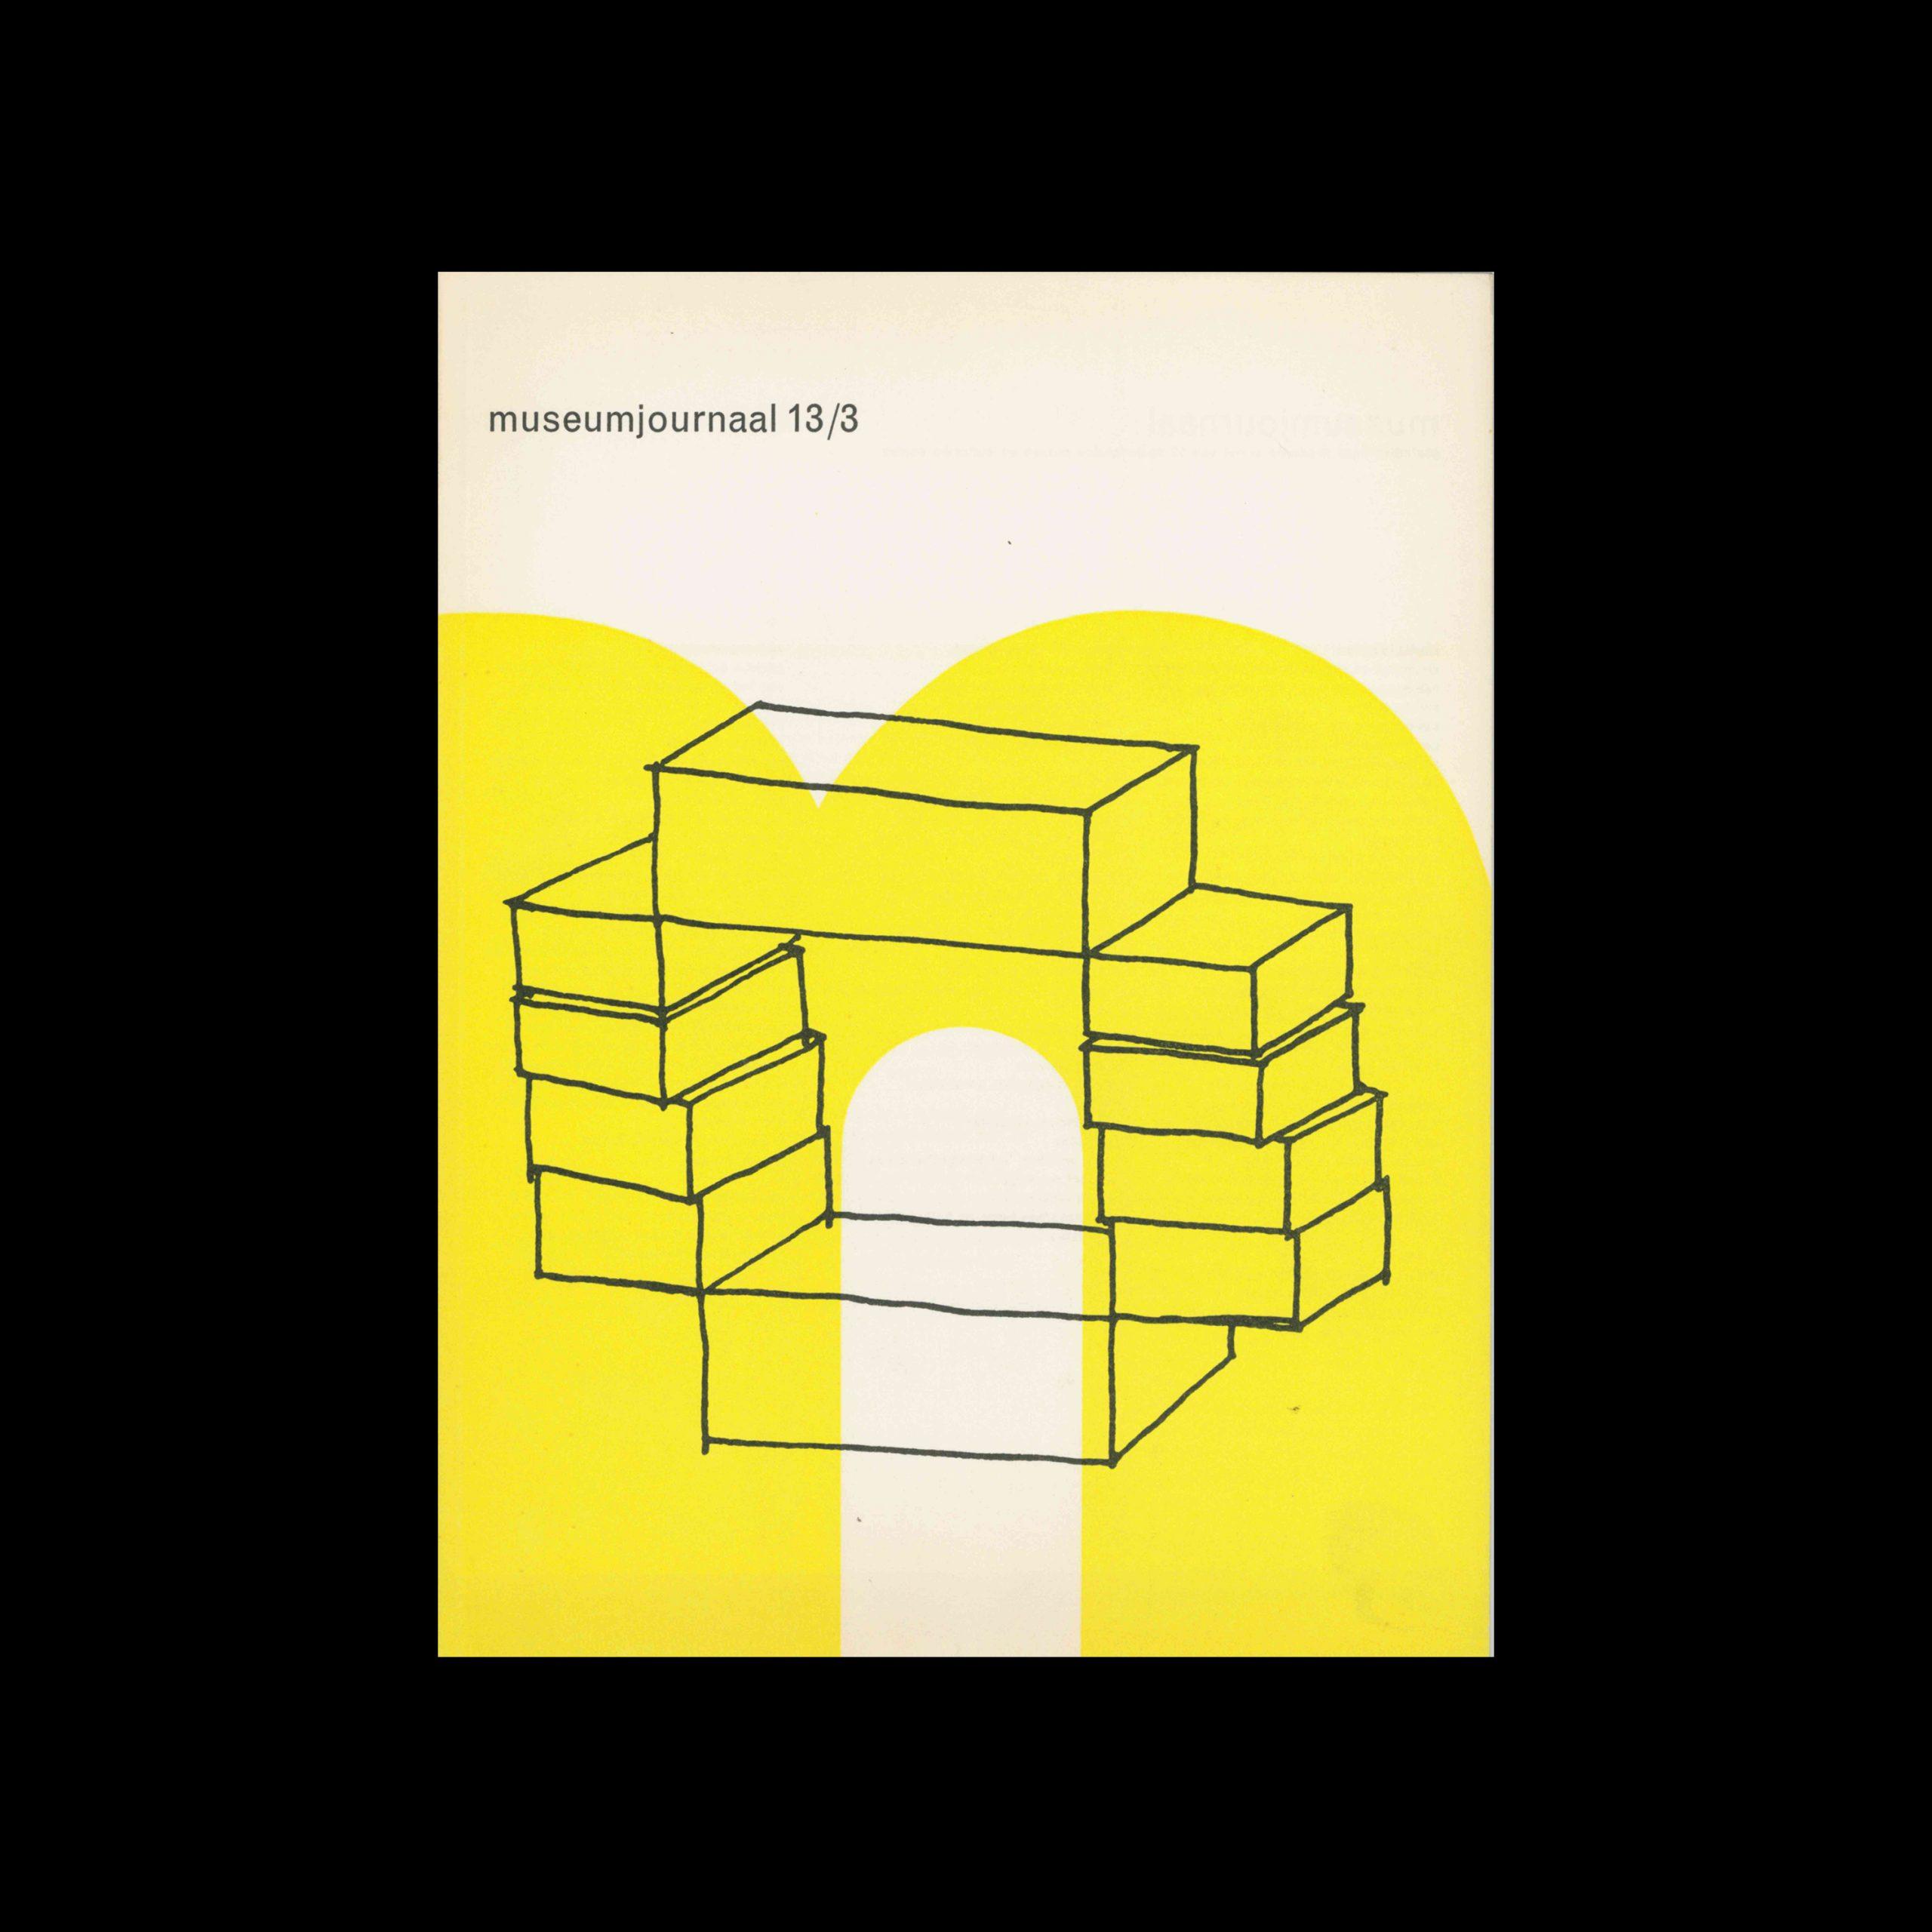 Museumjournaal, Serie 13 no3, 1968. Designed by Jurriaan Schrofer.